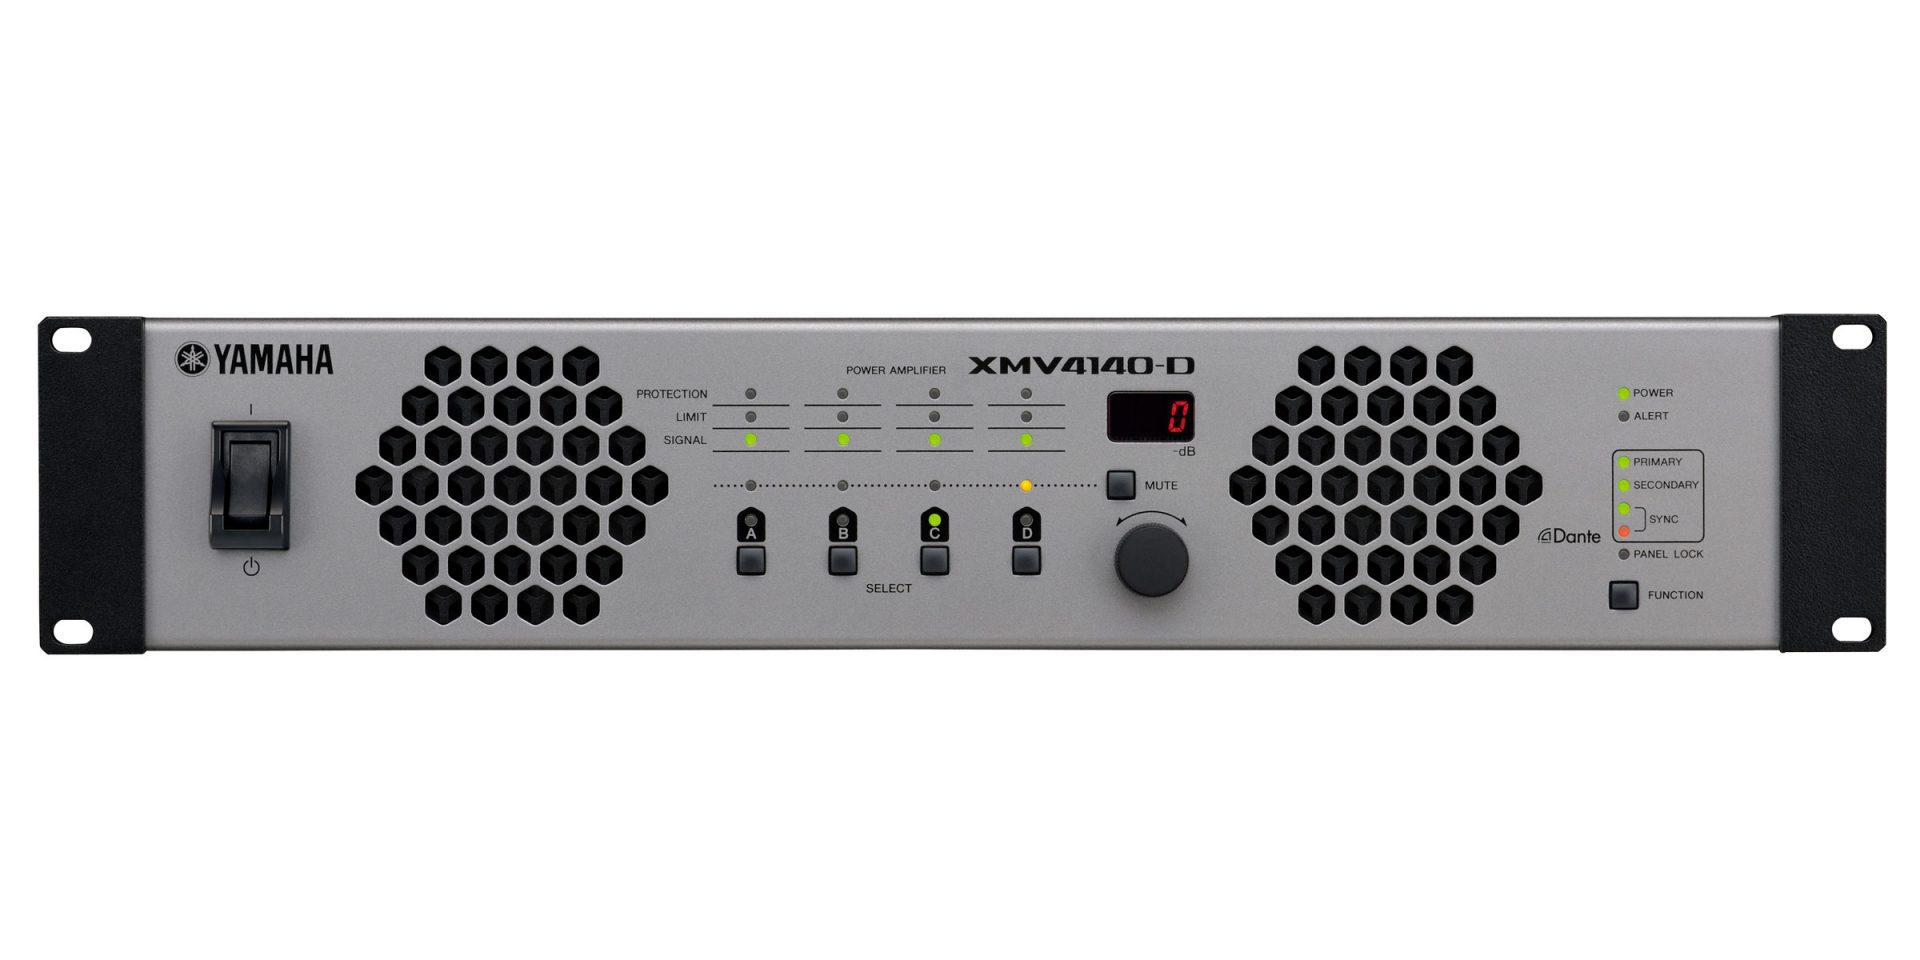 Yamaha XMV4140-D